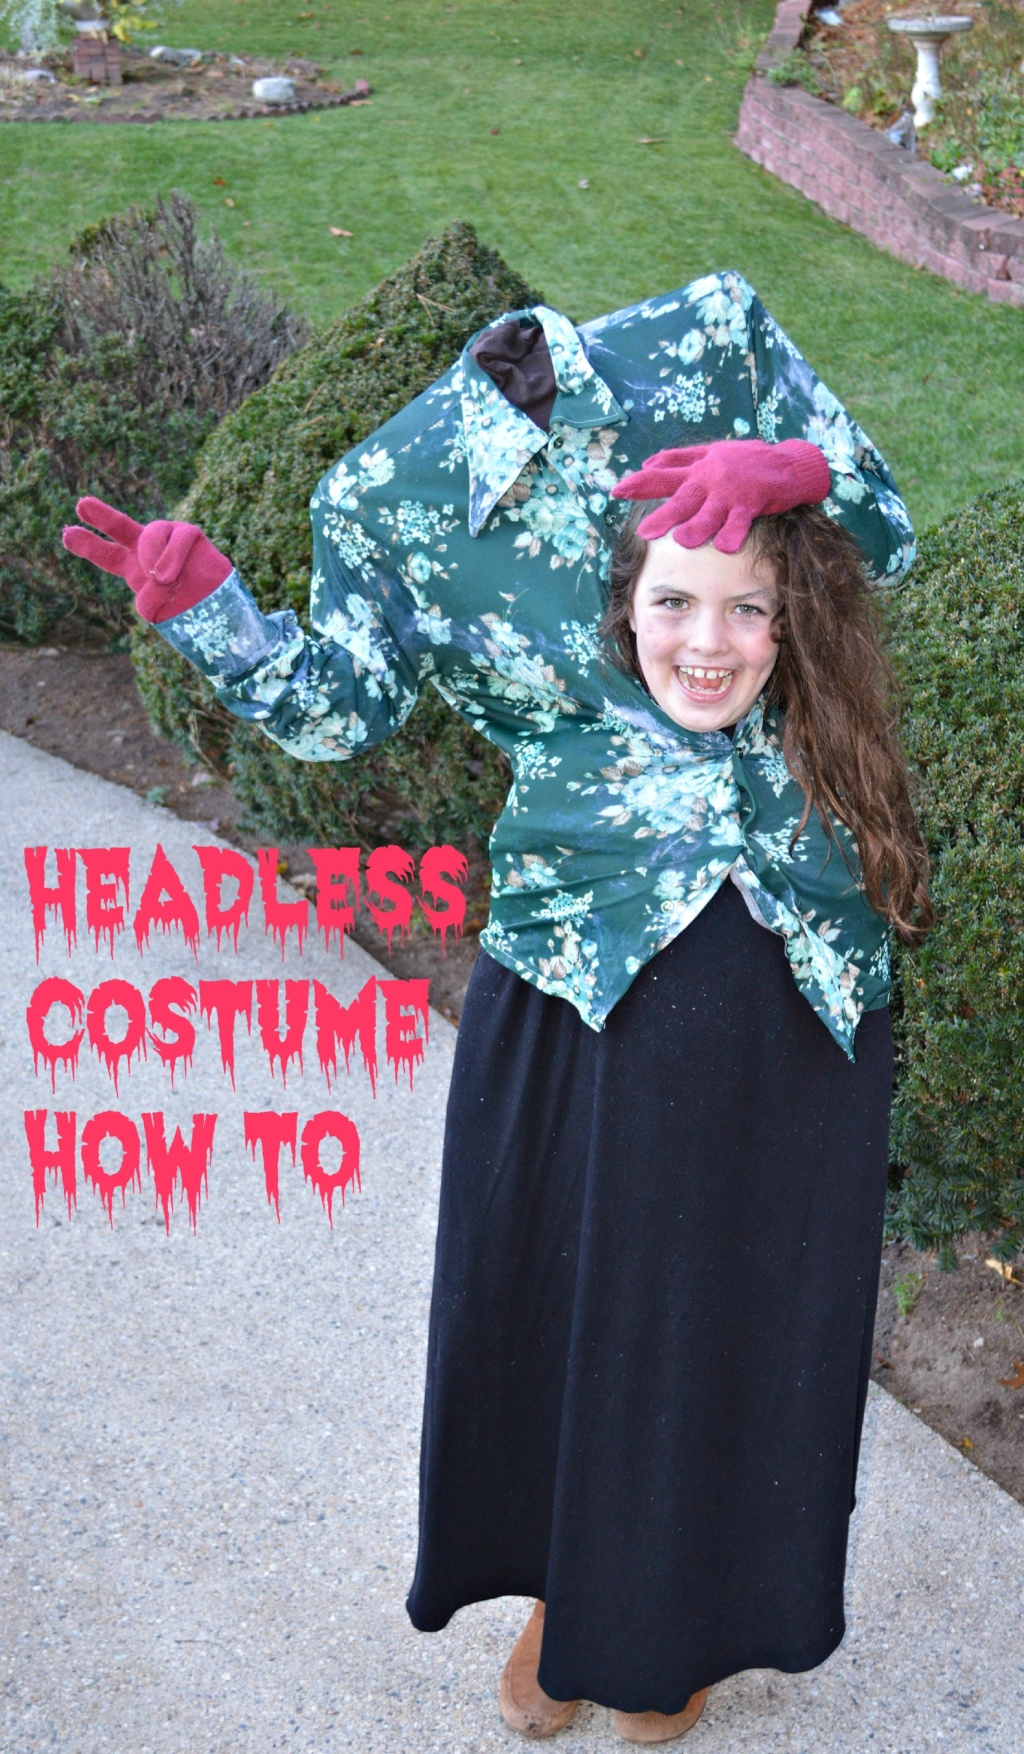 #write31days – Headless Costume How To